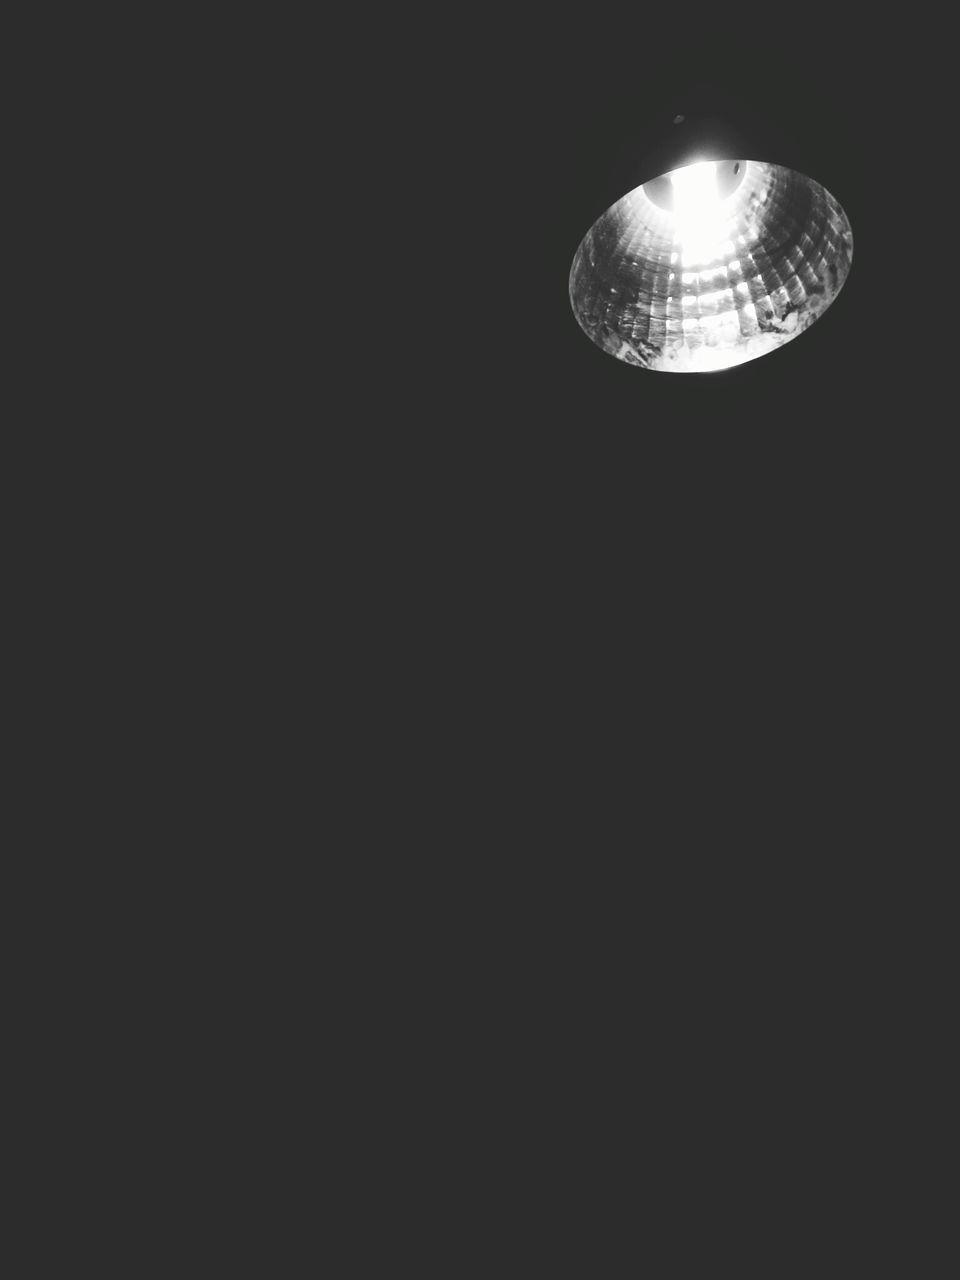 Low Angle View Of Illuminated Spotlight In Darkroom